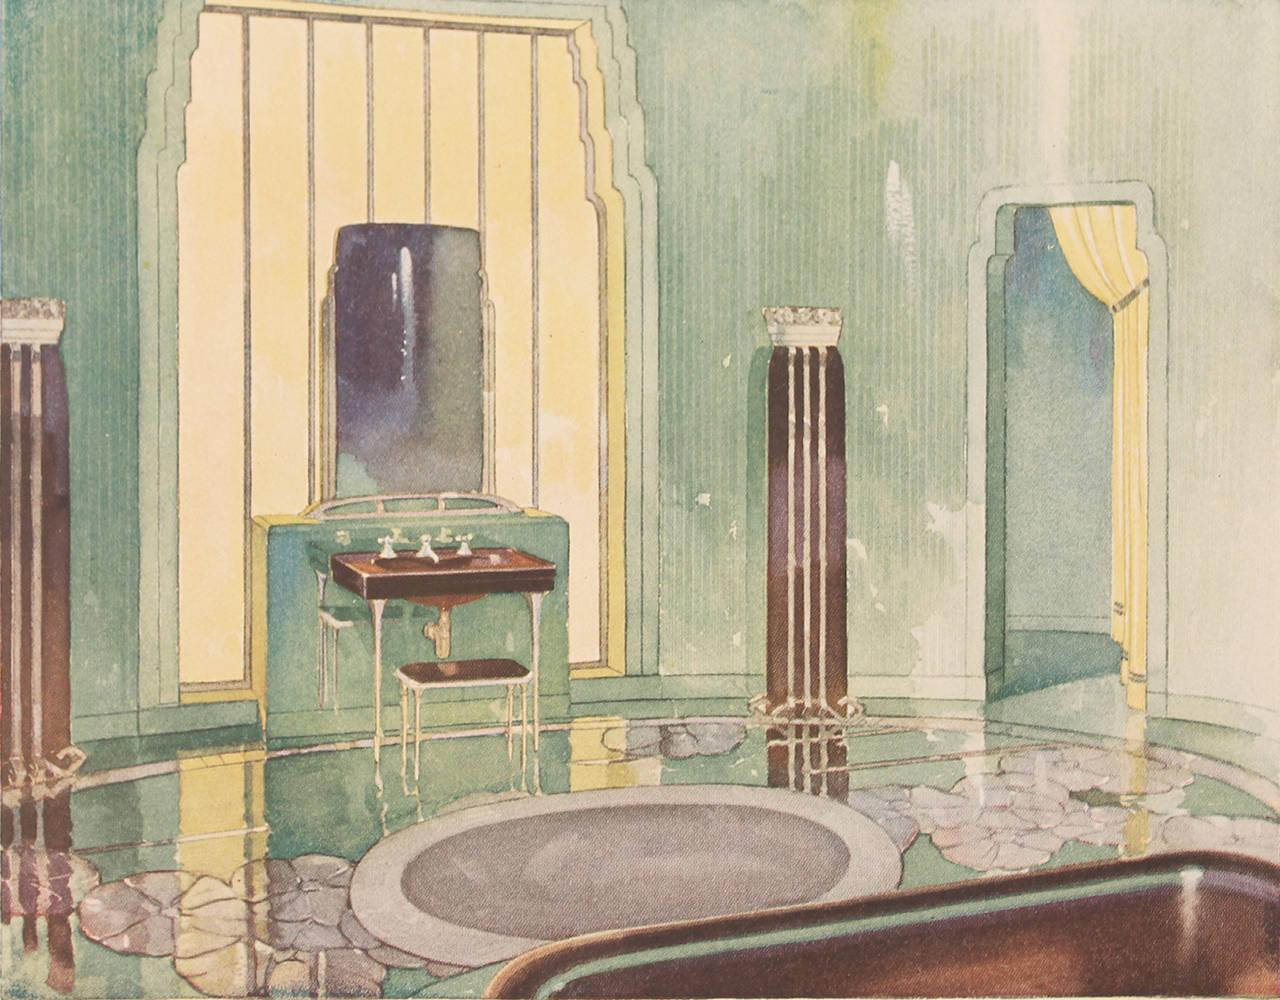 1931 Art Deco Bathroom Interior Design Architecture Reference Book In Excellent Condition For Sale Bremen